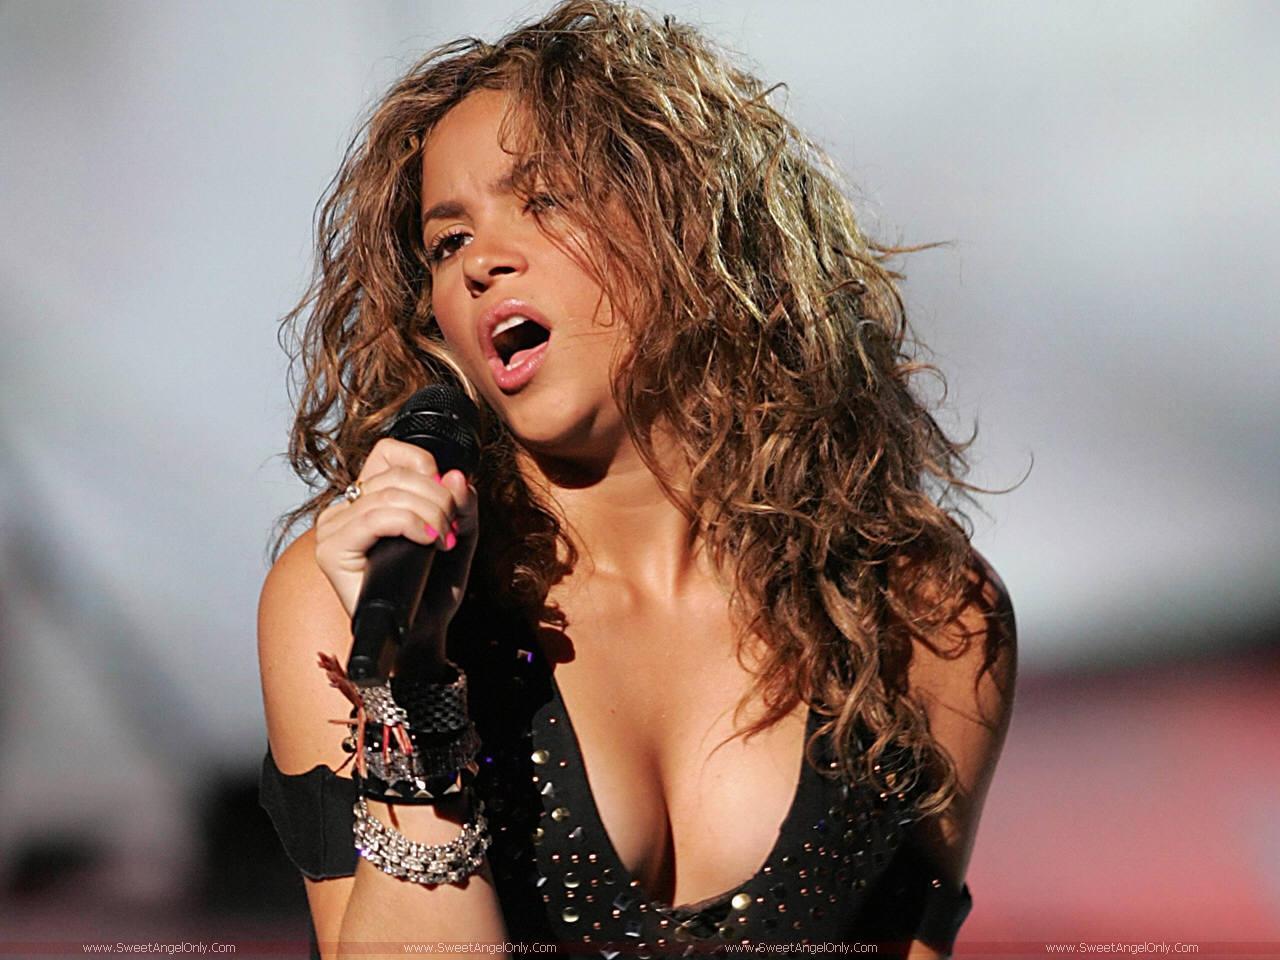 http://2.bp.blogspot.com/-RvlWGgp__S4/TmDncycIz8I/AAAAAAAAKKQ/QSN6SZJoQr8/s1600/Shakira_wallpaper.jpg